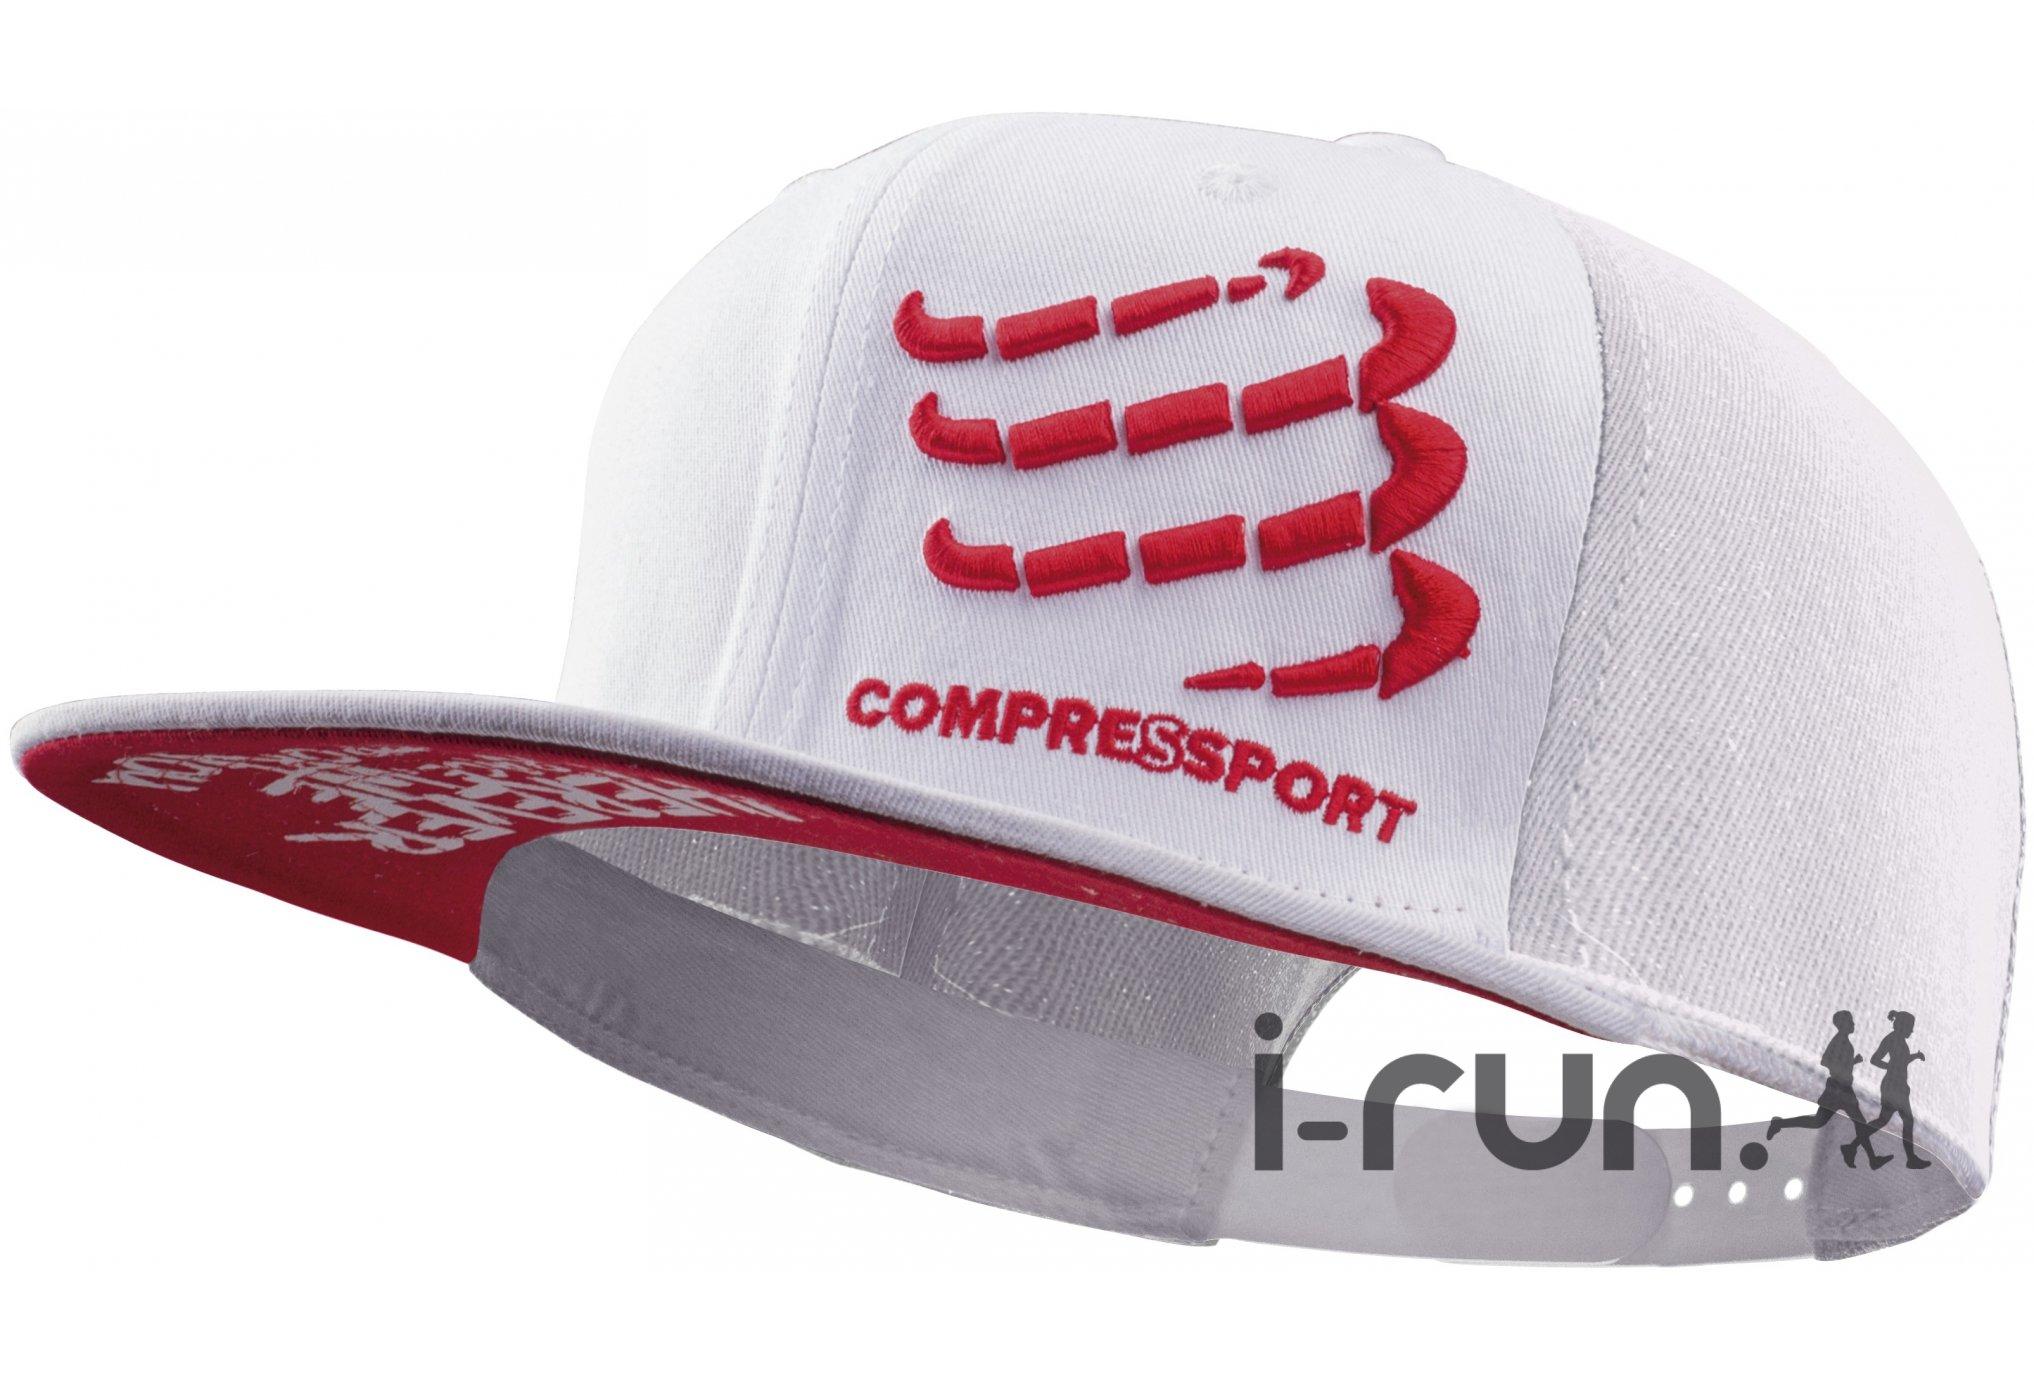 Compressport Flat Casquettes / bandeaux